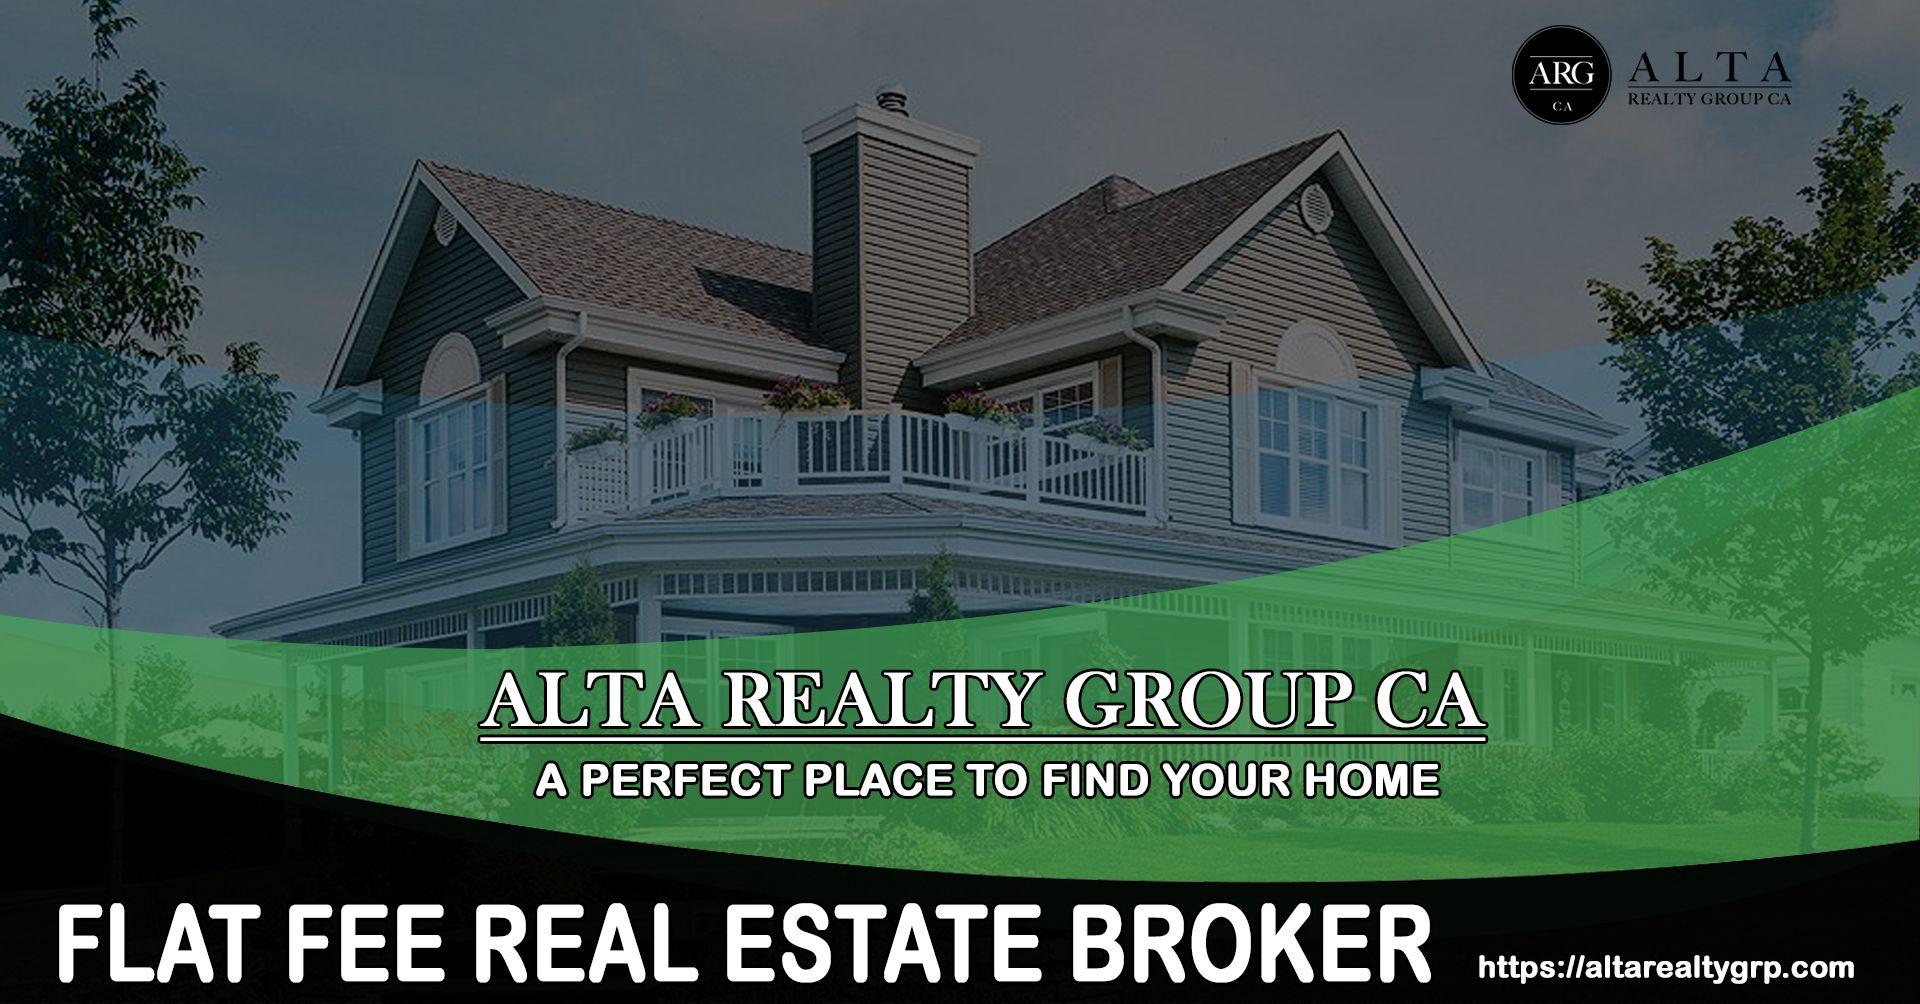 Flat Fee Real Estate Broker Real Estate Real Estate Trends Real Estate Broker